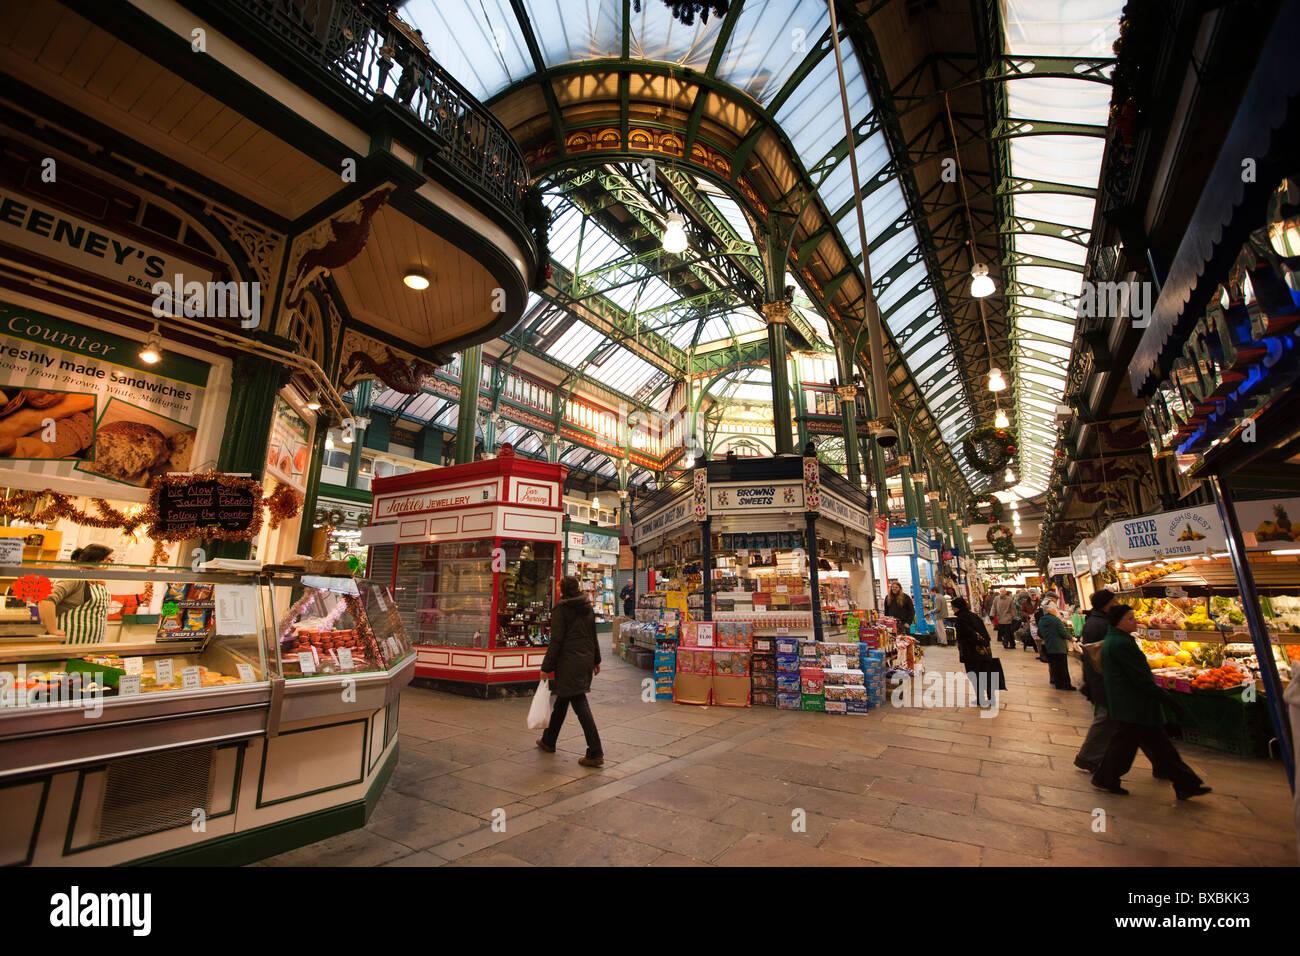 UK, England, Yorkshire, Leeds, New Market Street, Kirkgate Market Stock Photo - Alamy